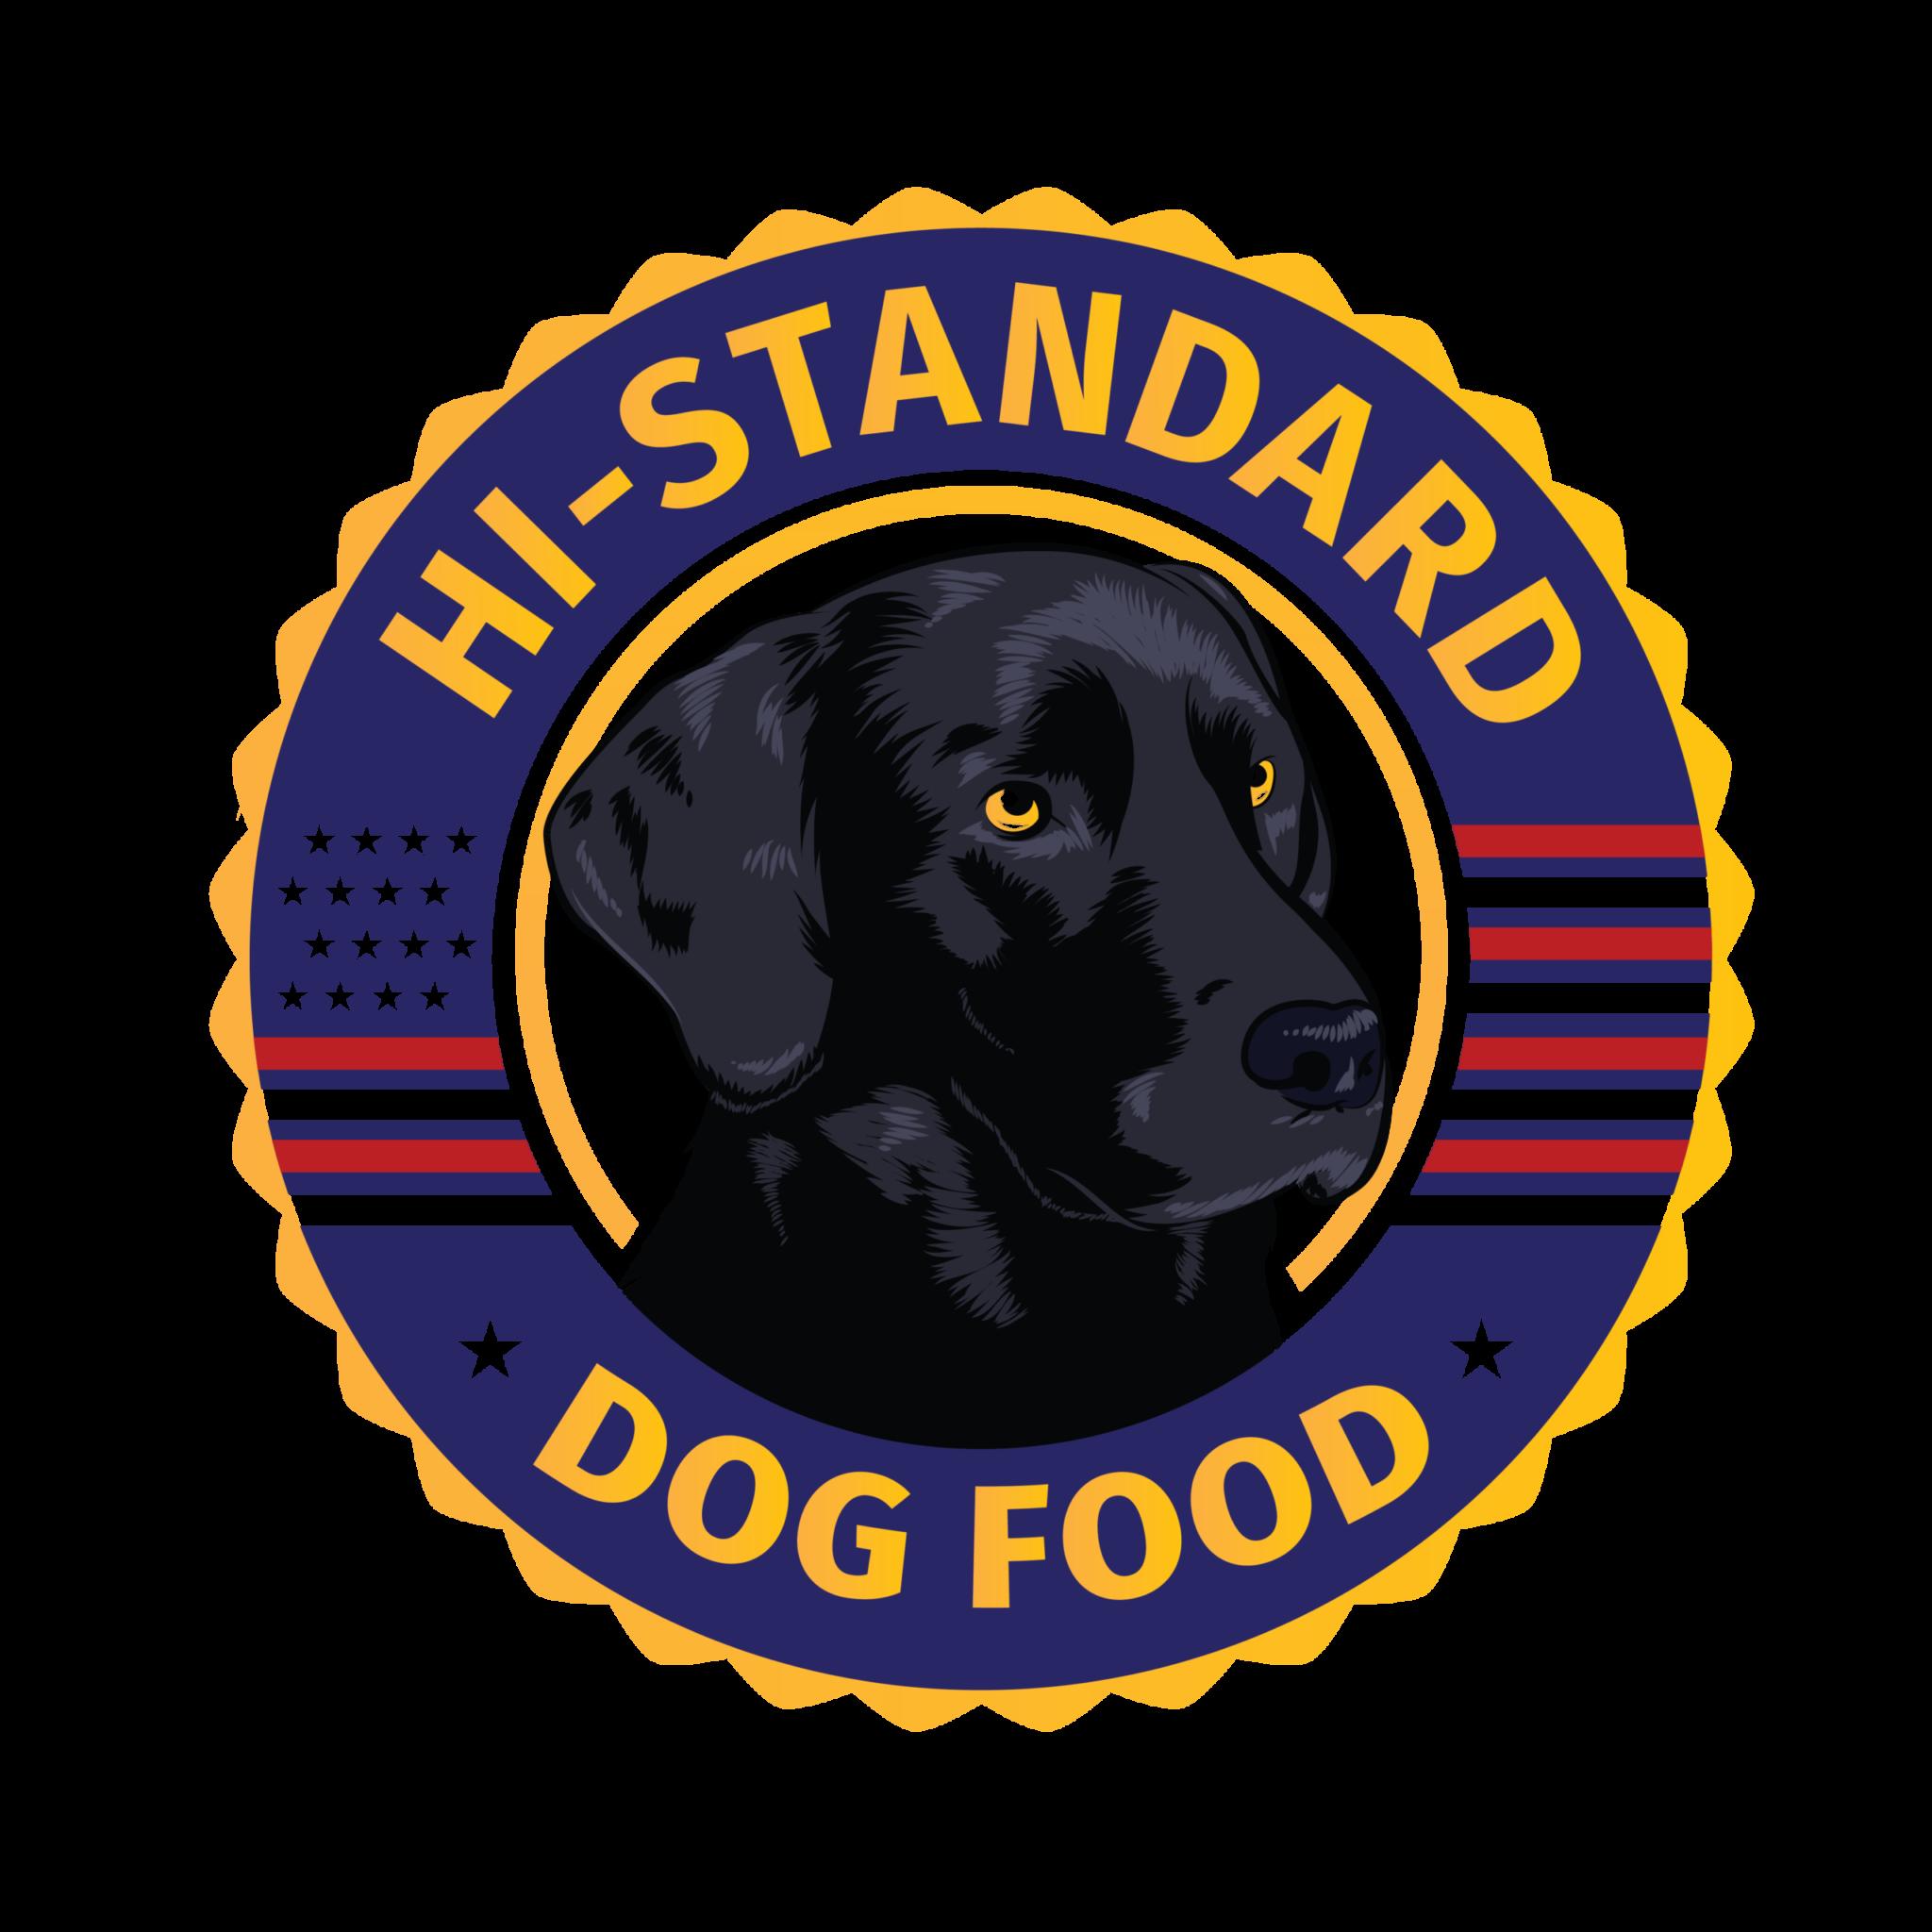 Hi Standard dog logo